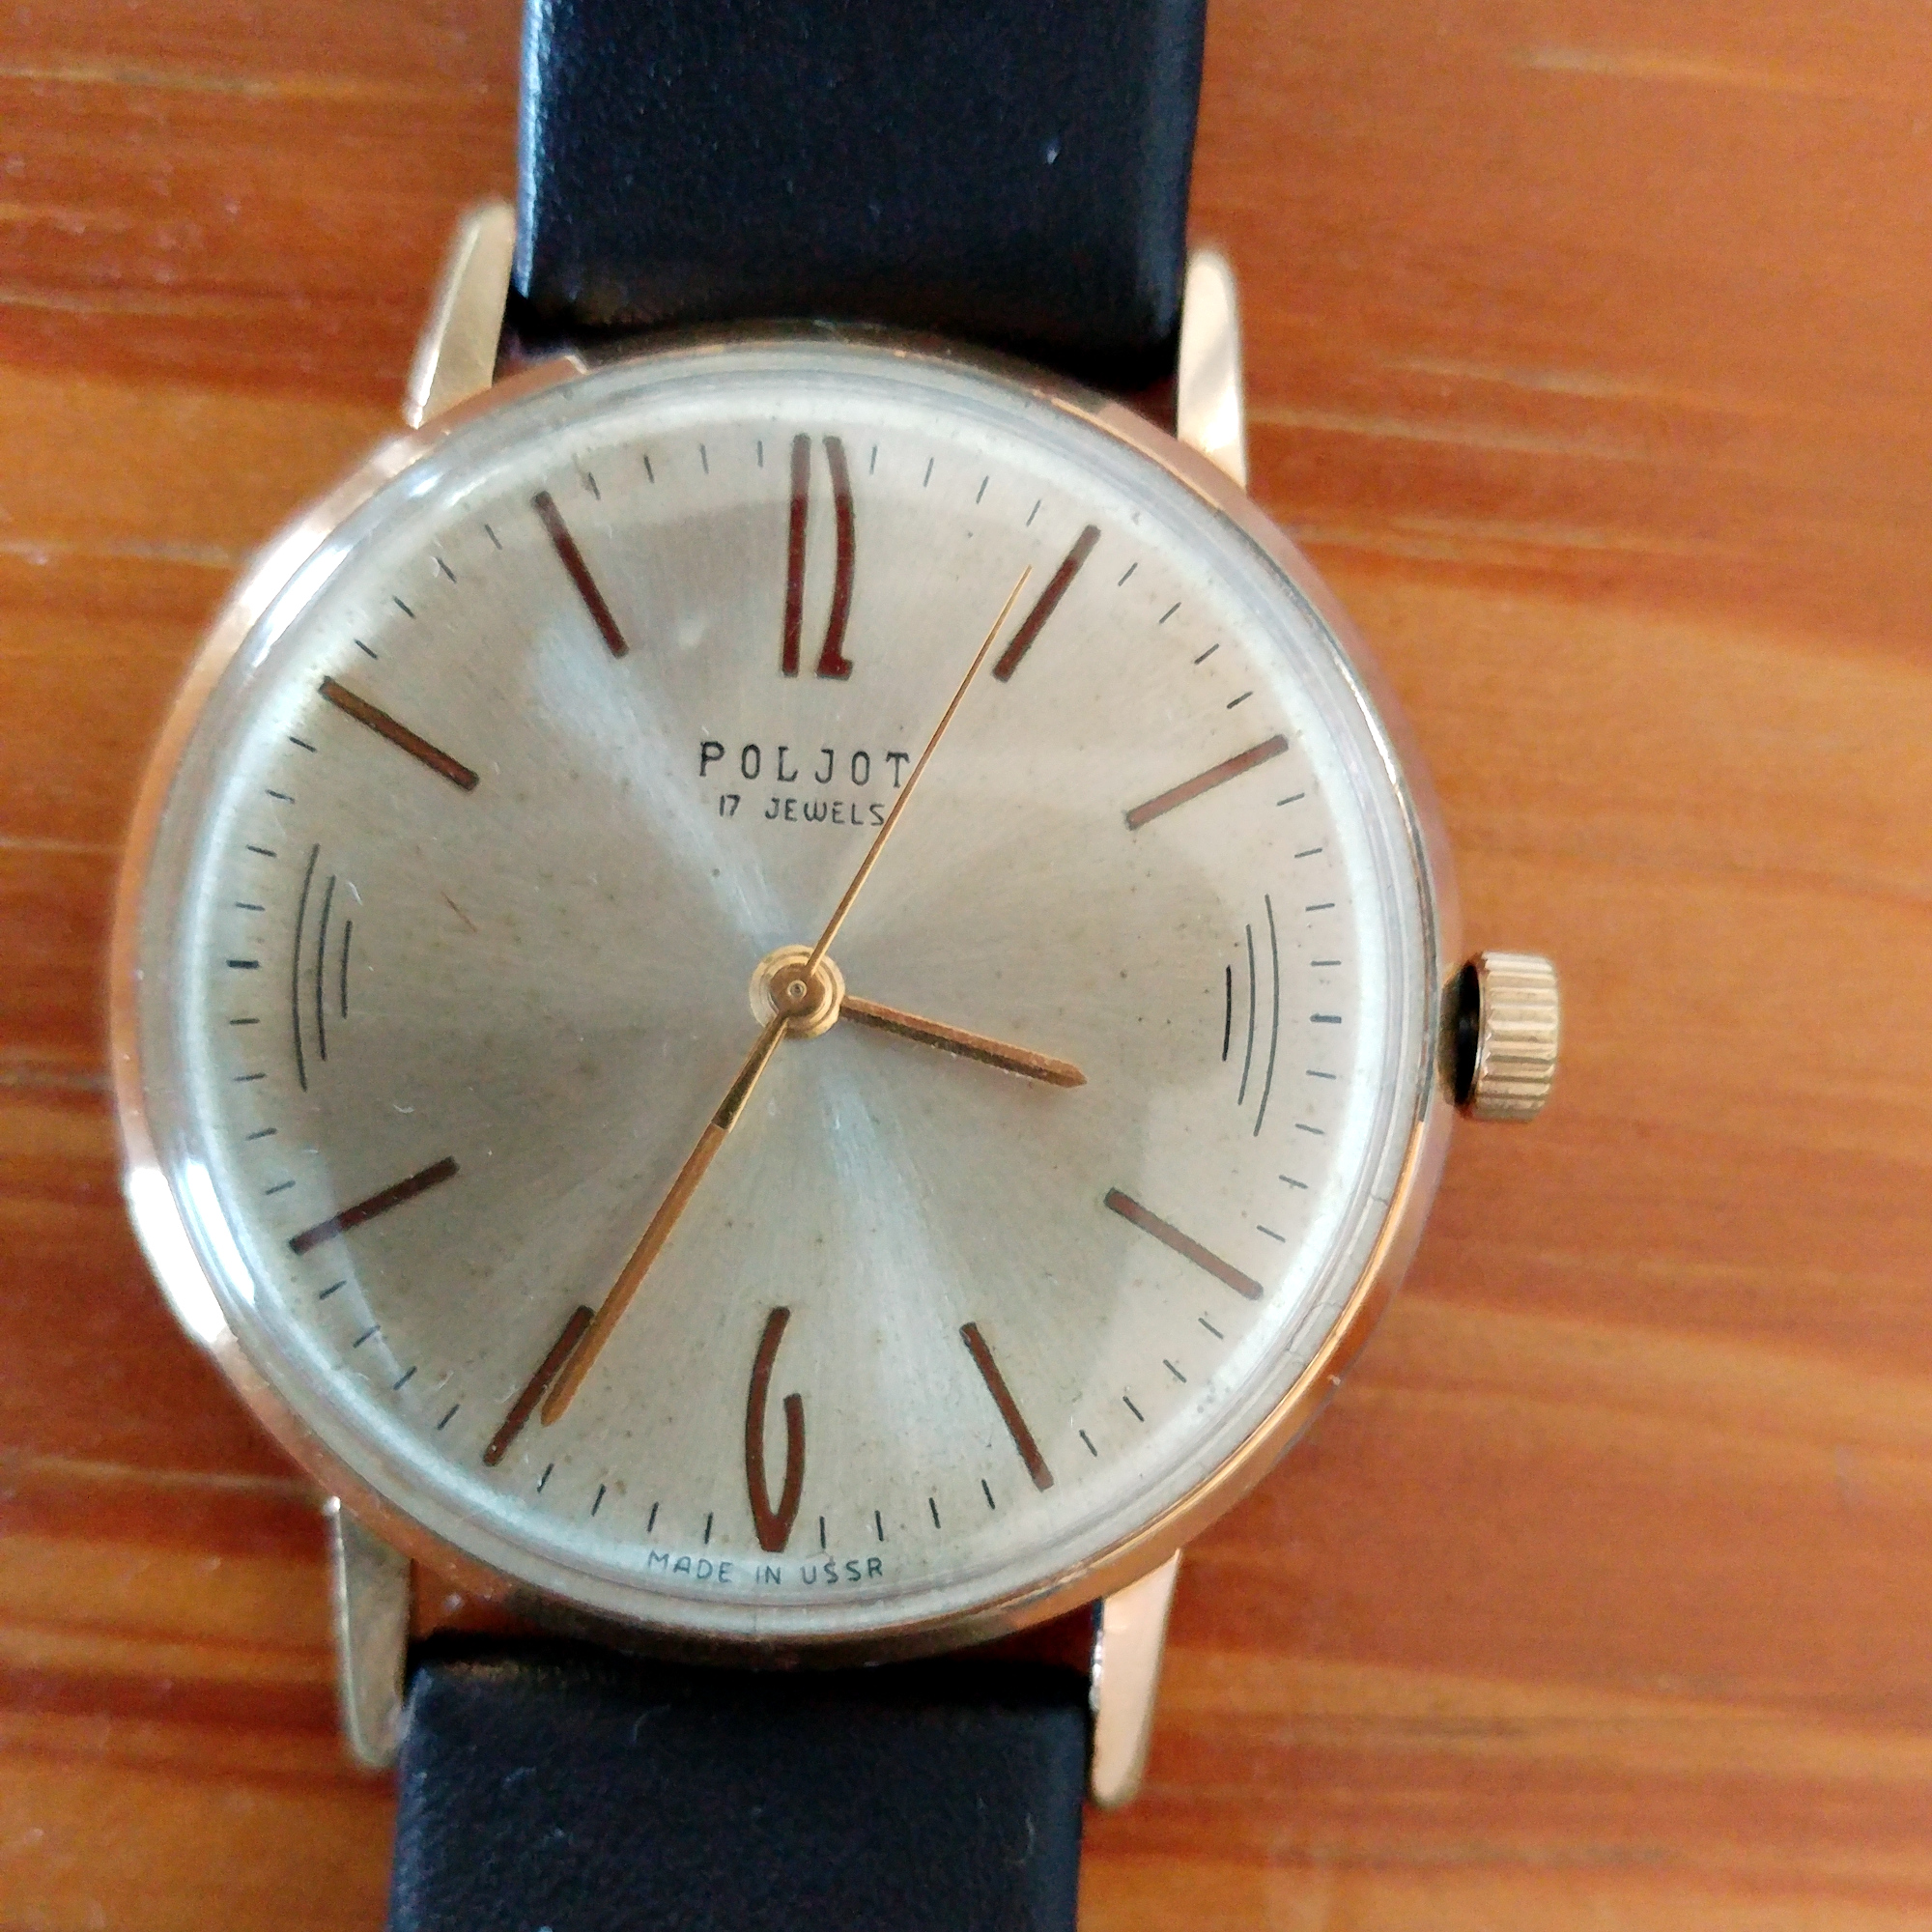 Name:  my poljot watch.jpg Views: 91 Size:  1.85 MB